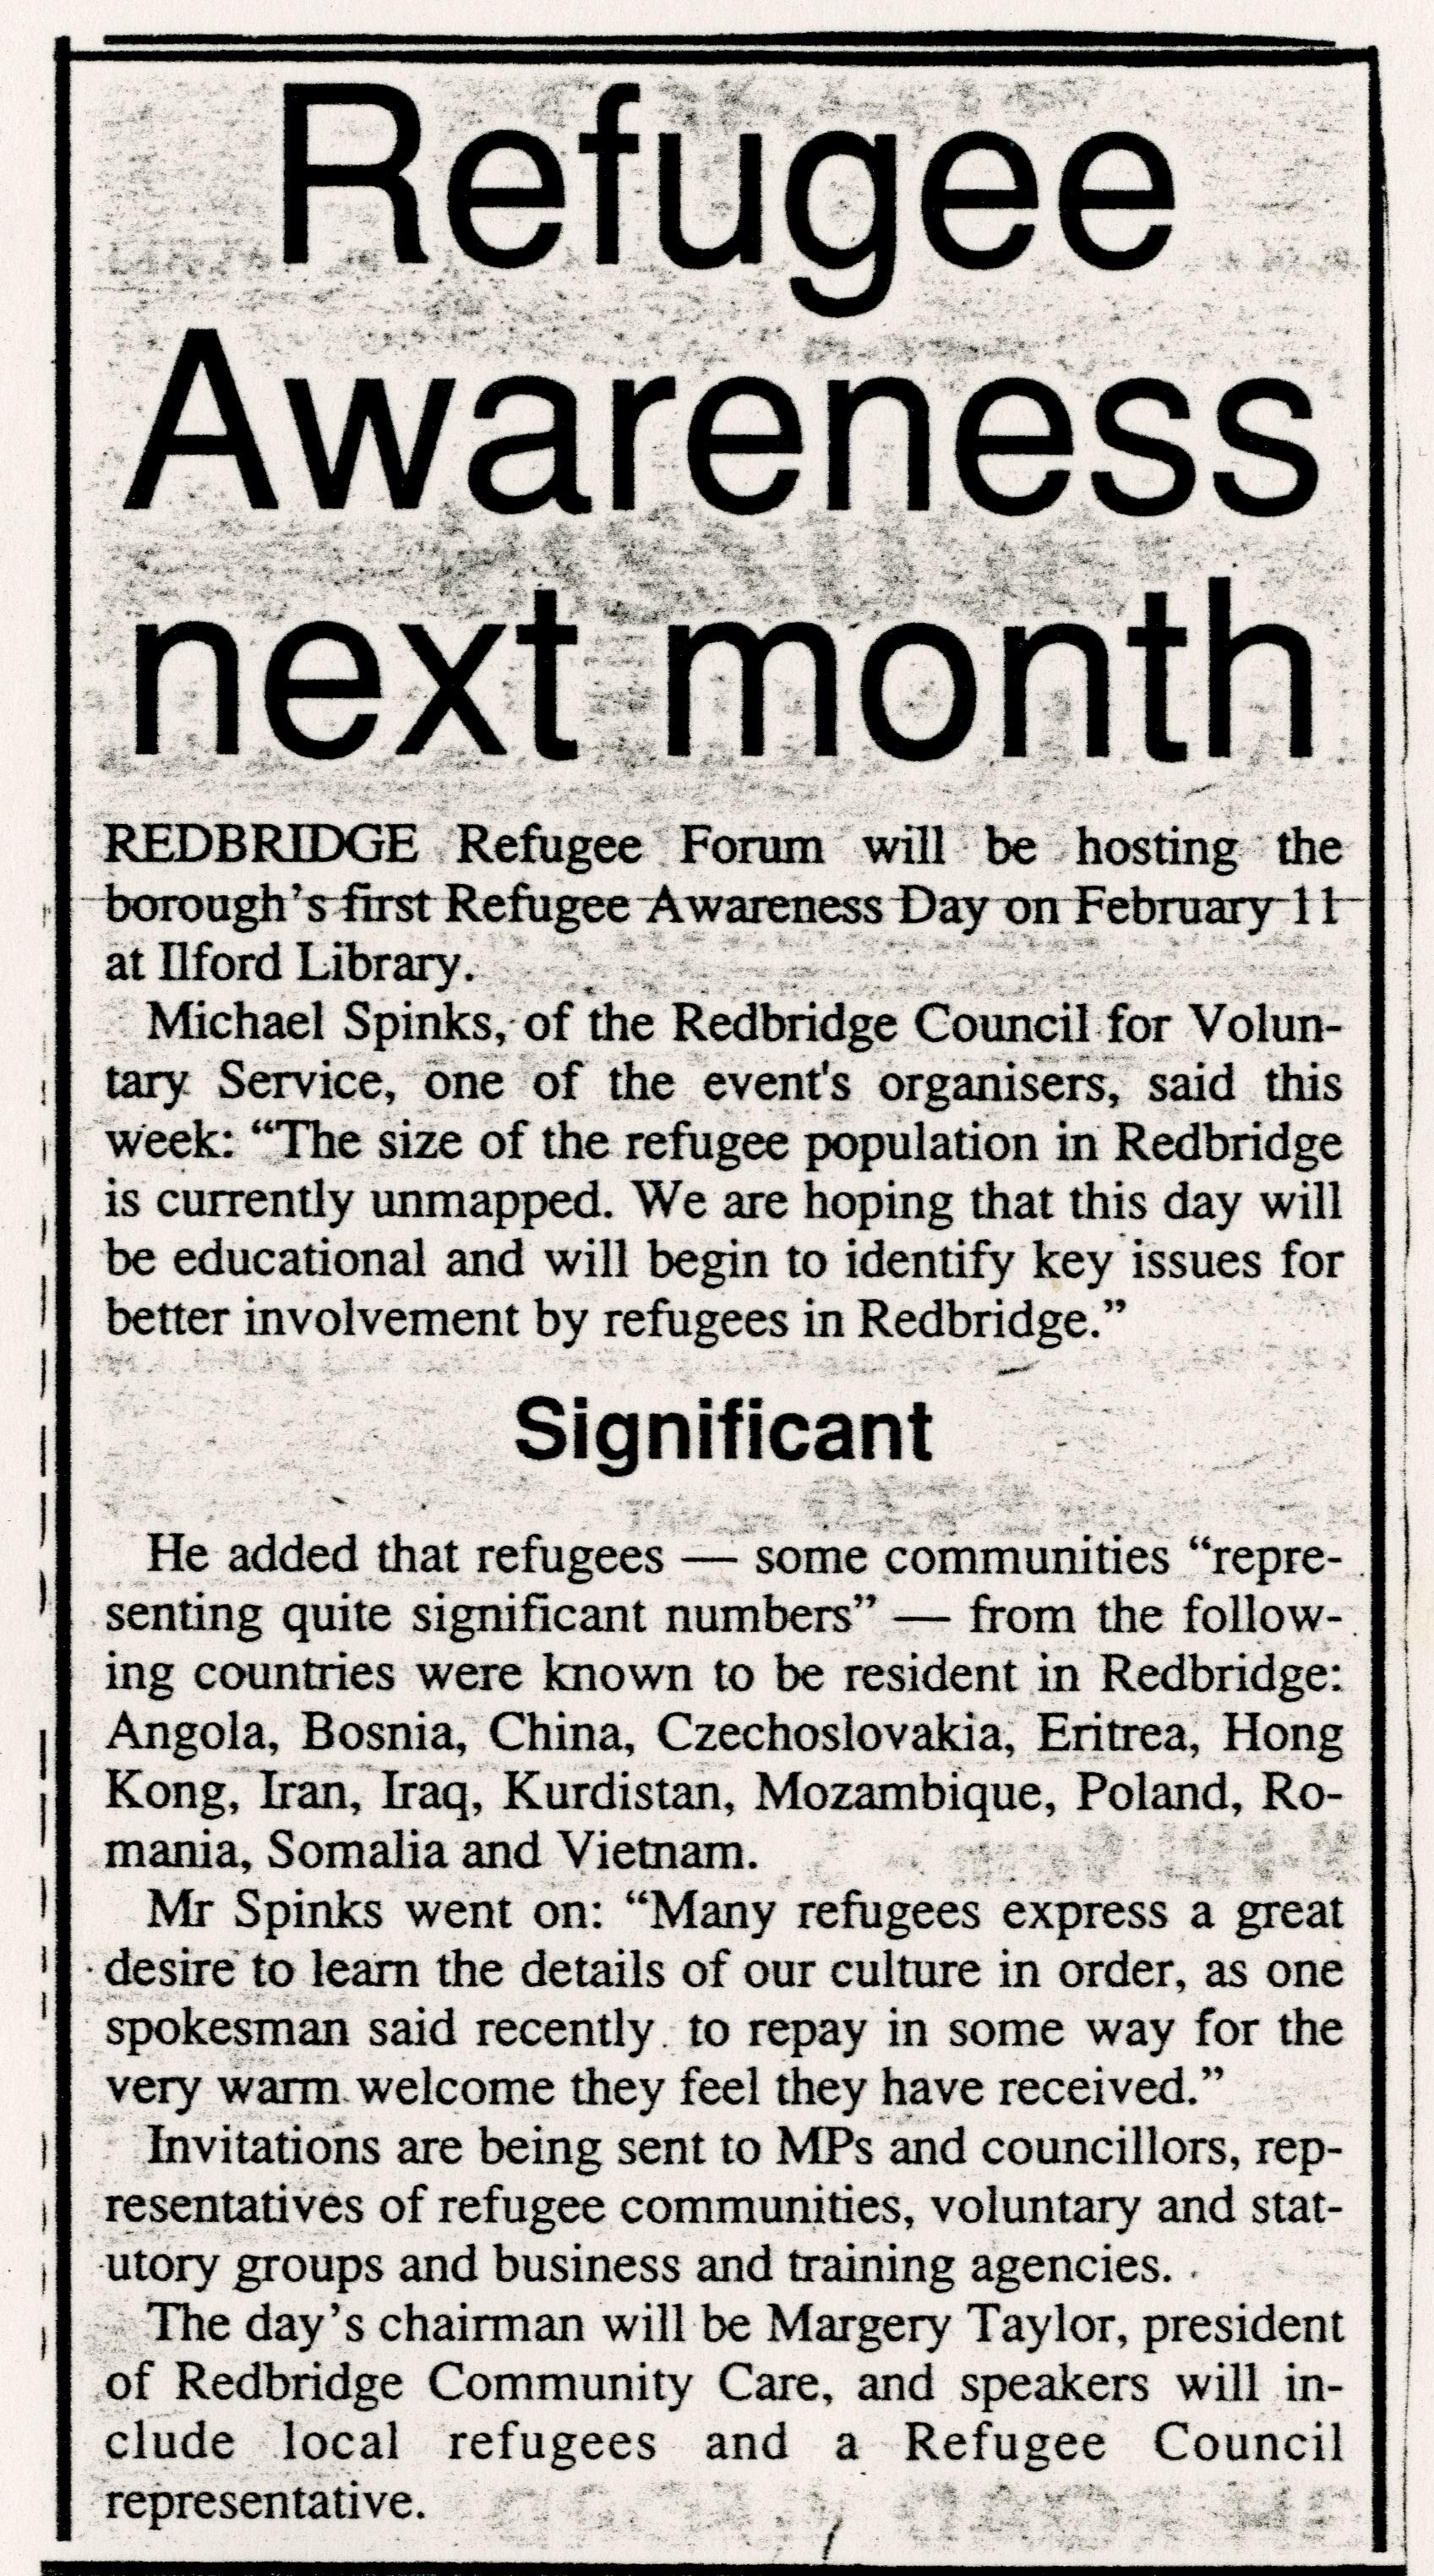 Refugee Awareness Month